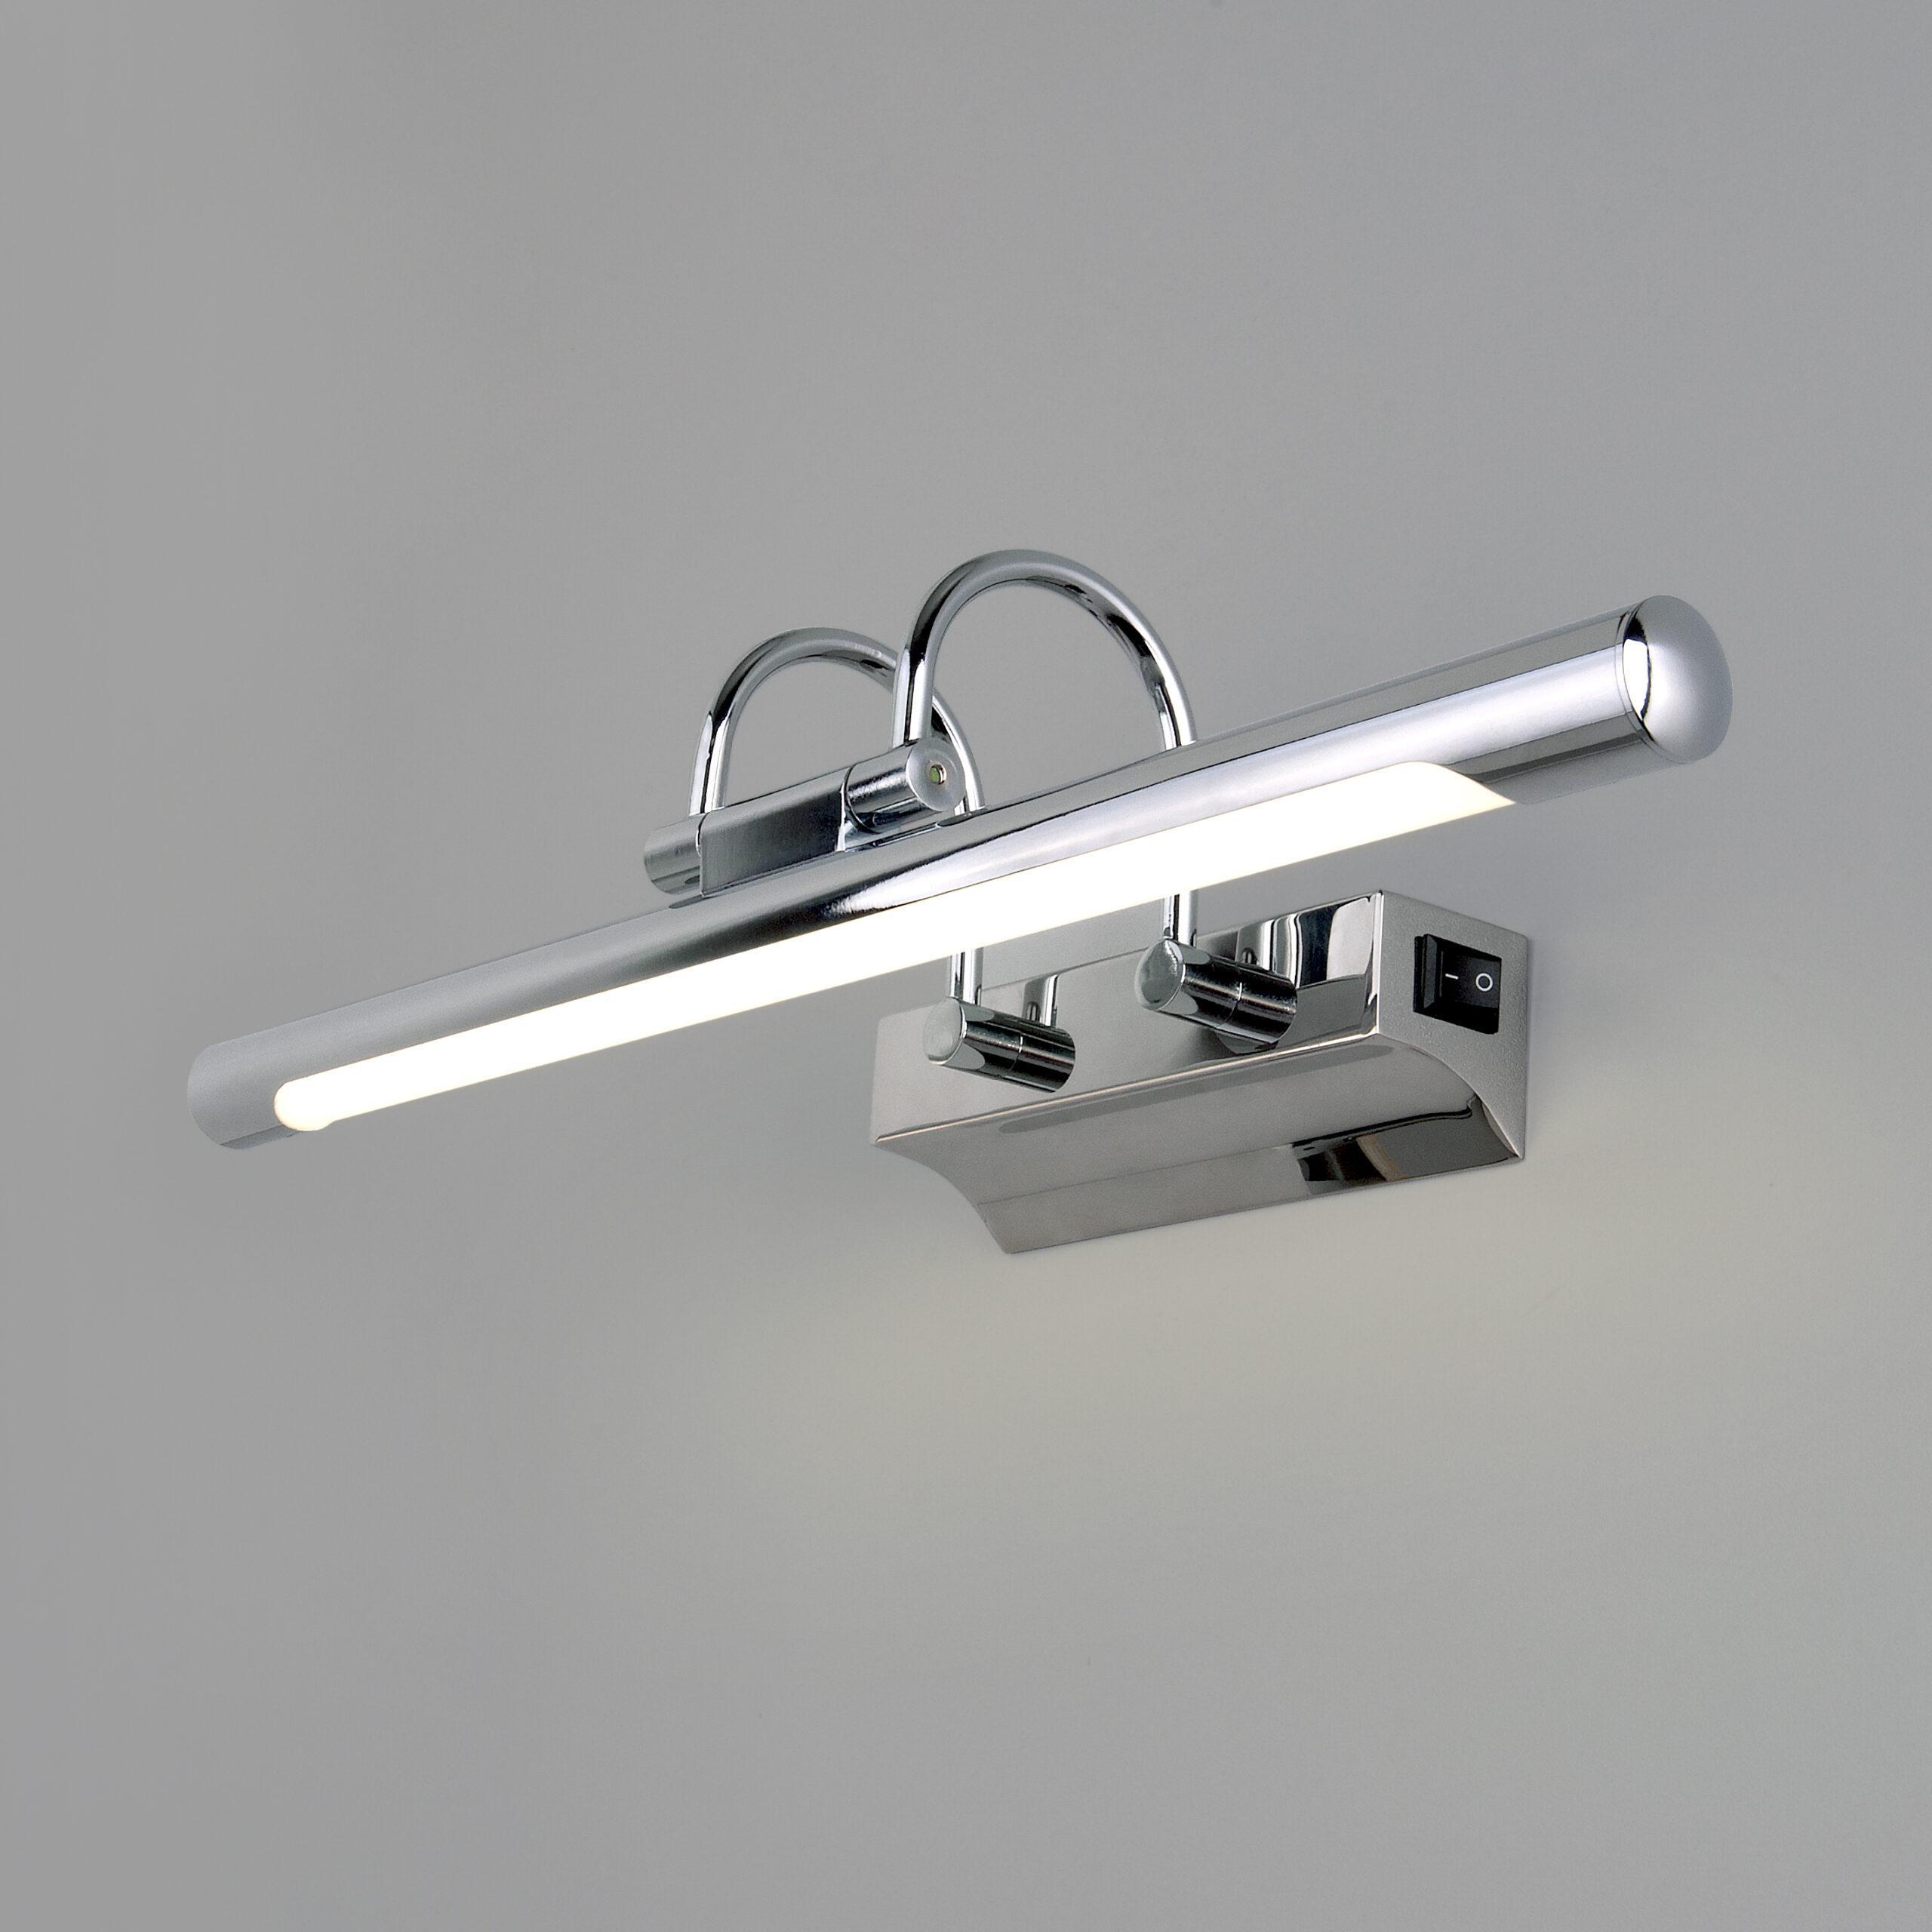 Flint Neo SW LED хром (MRL LED 1022) с выключателем